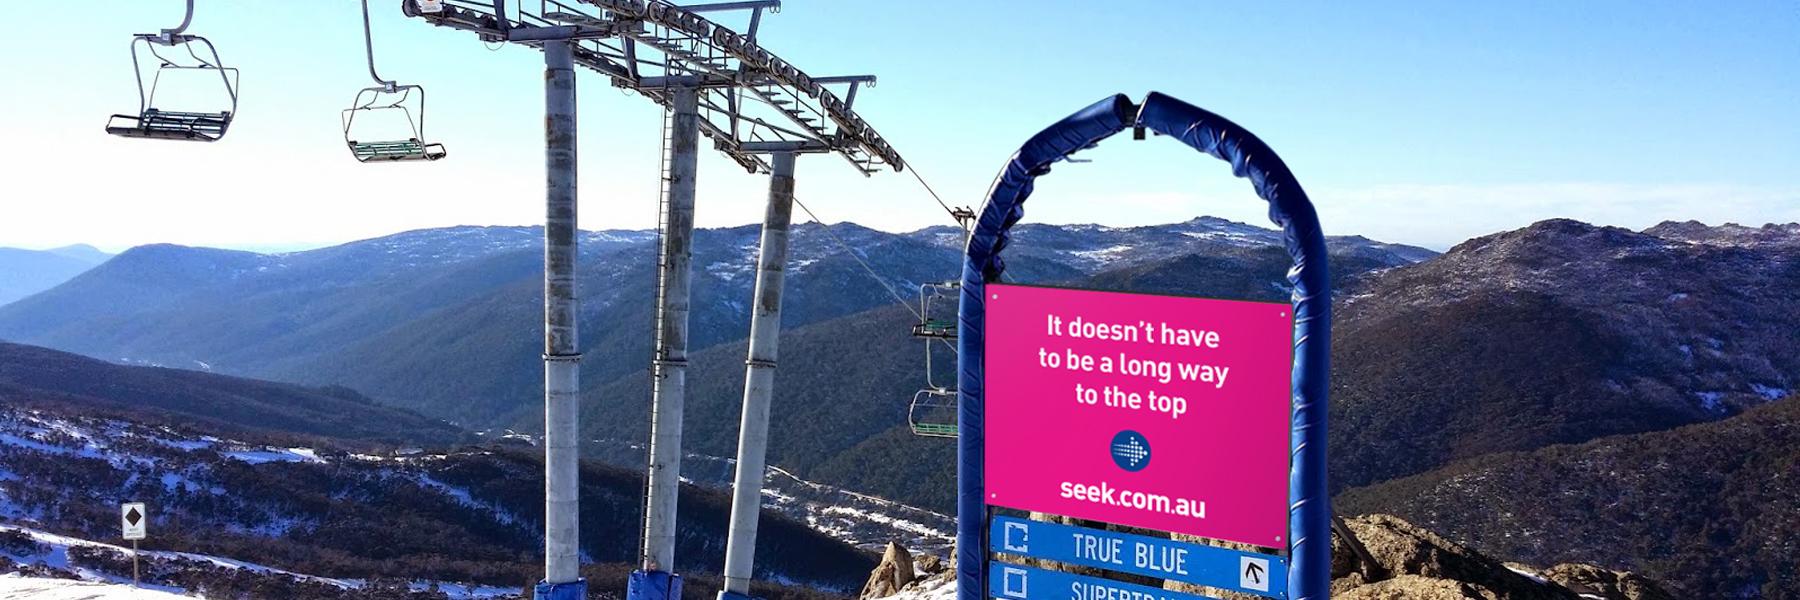 Seek - Creative Ski Advertising Campaign